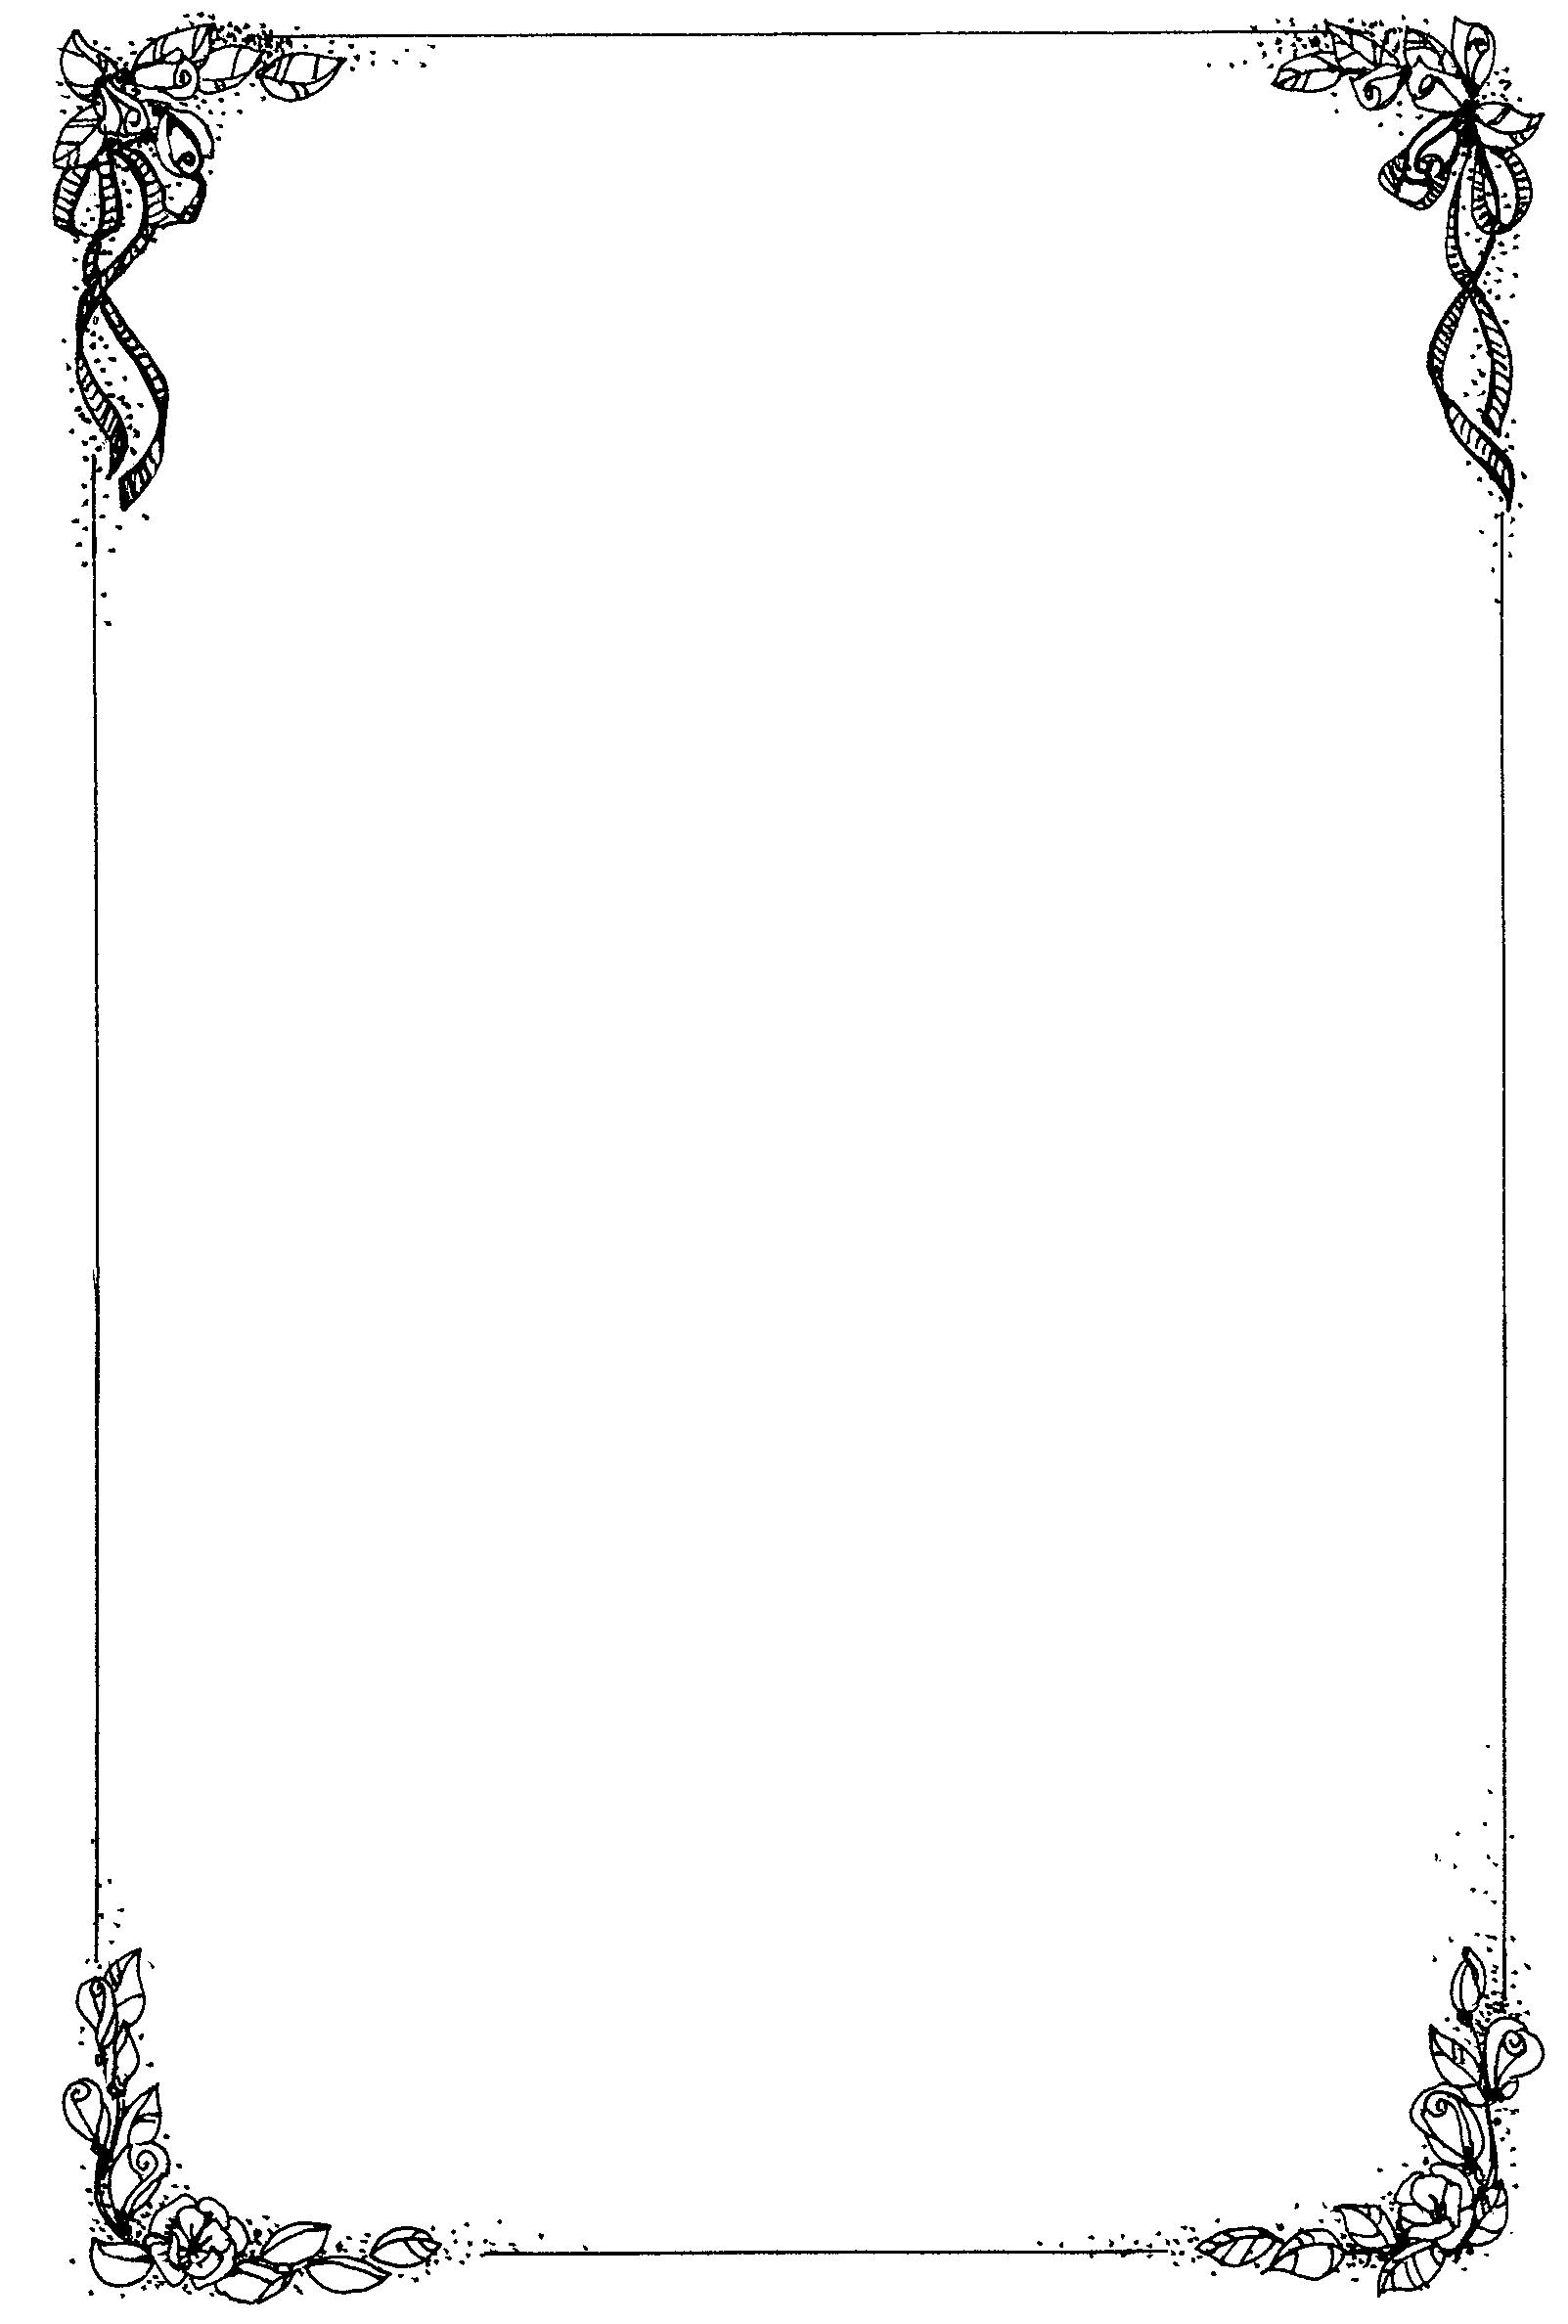 Banner clipart invitation. Free wedding border cliparts